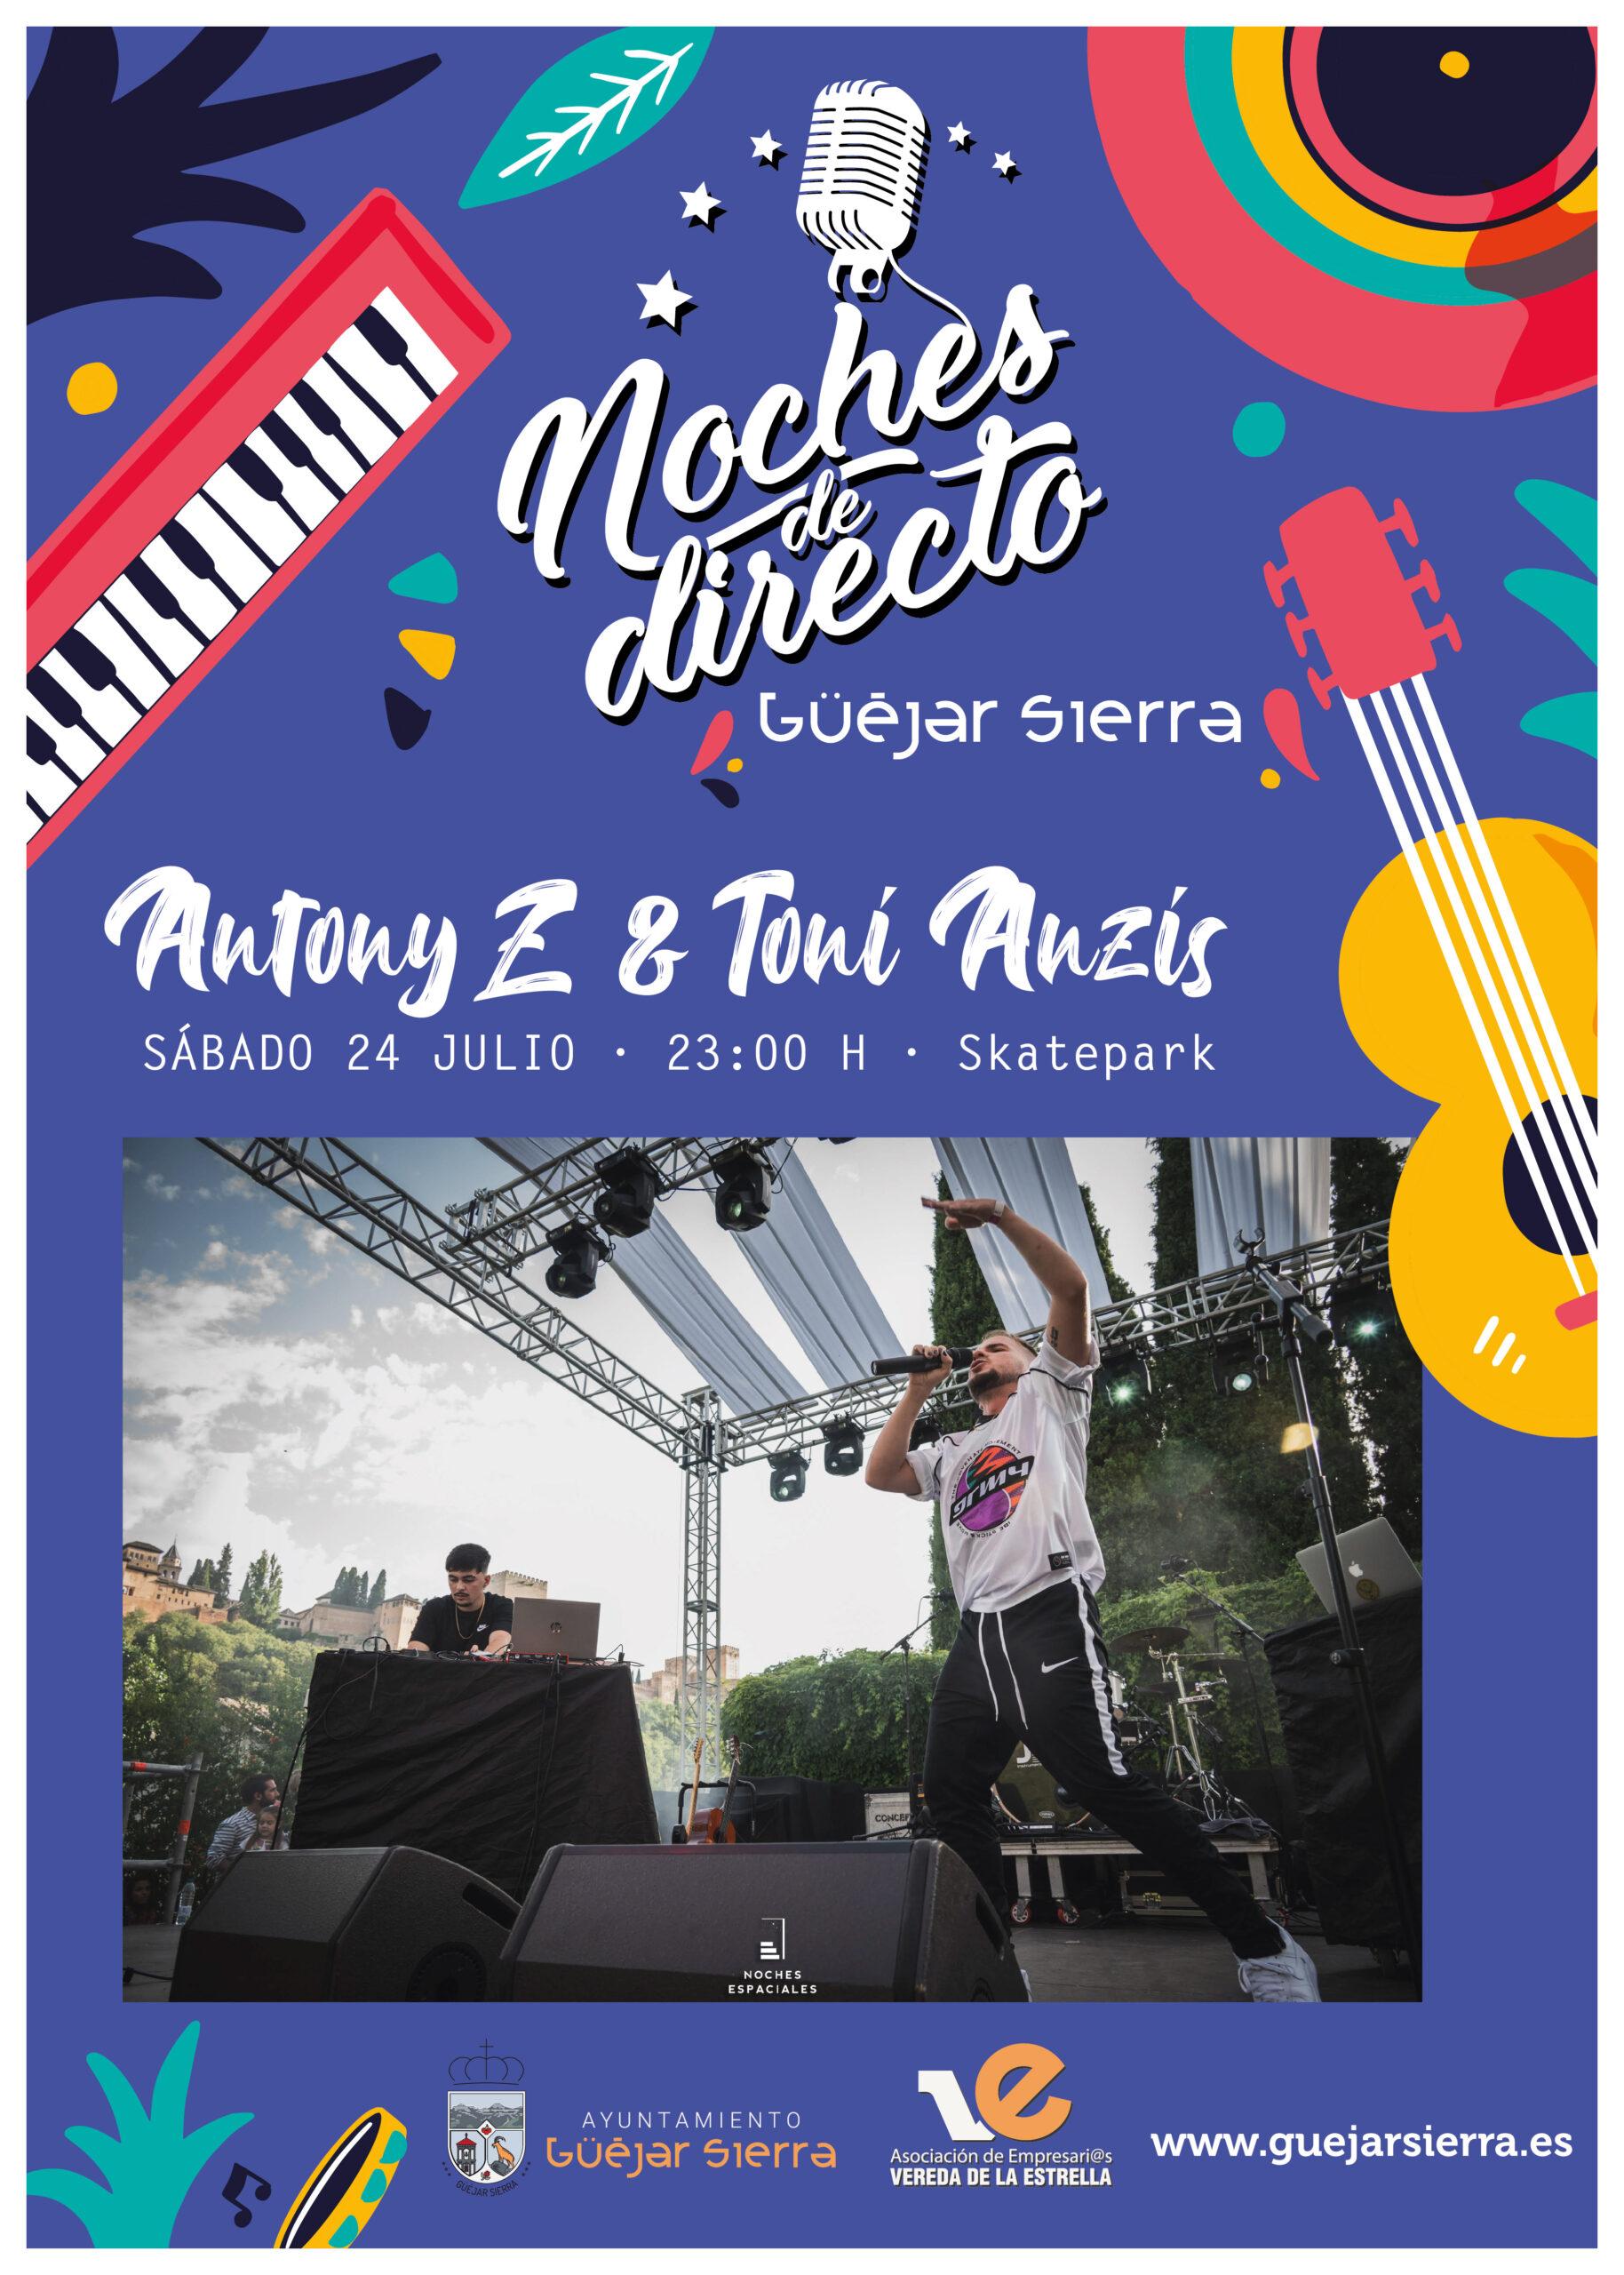 NOCHES DE DIRECTO – Antony Z & toni anzis (Mandela show)